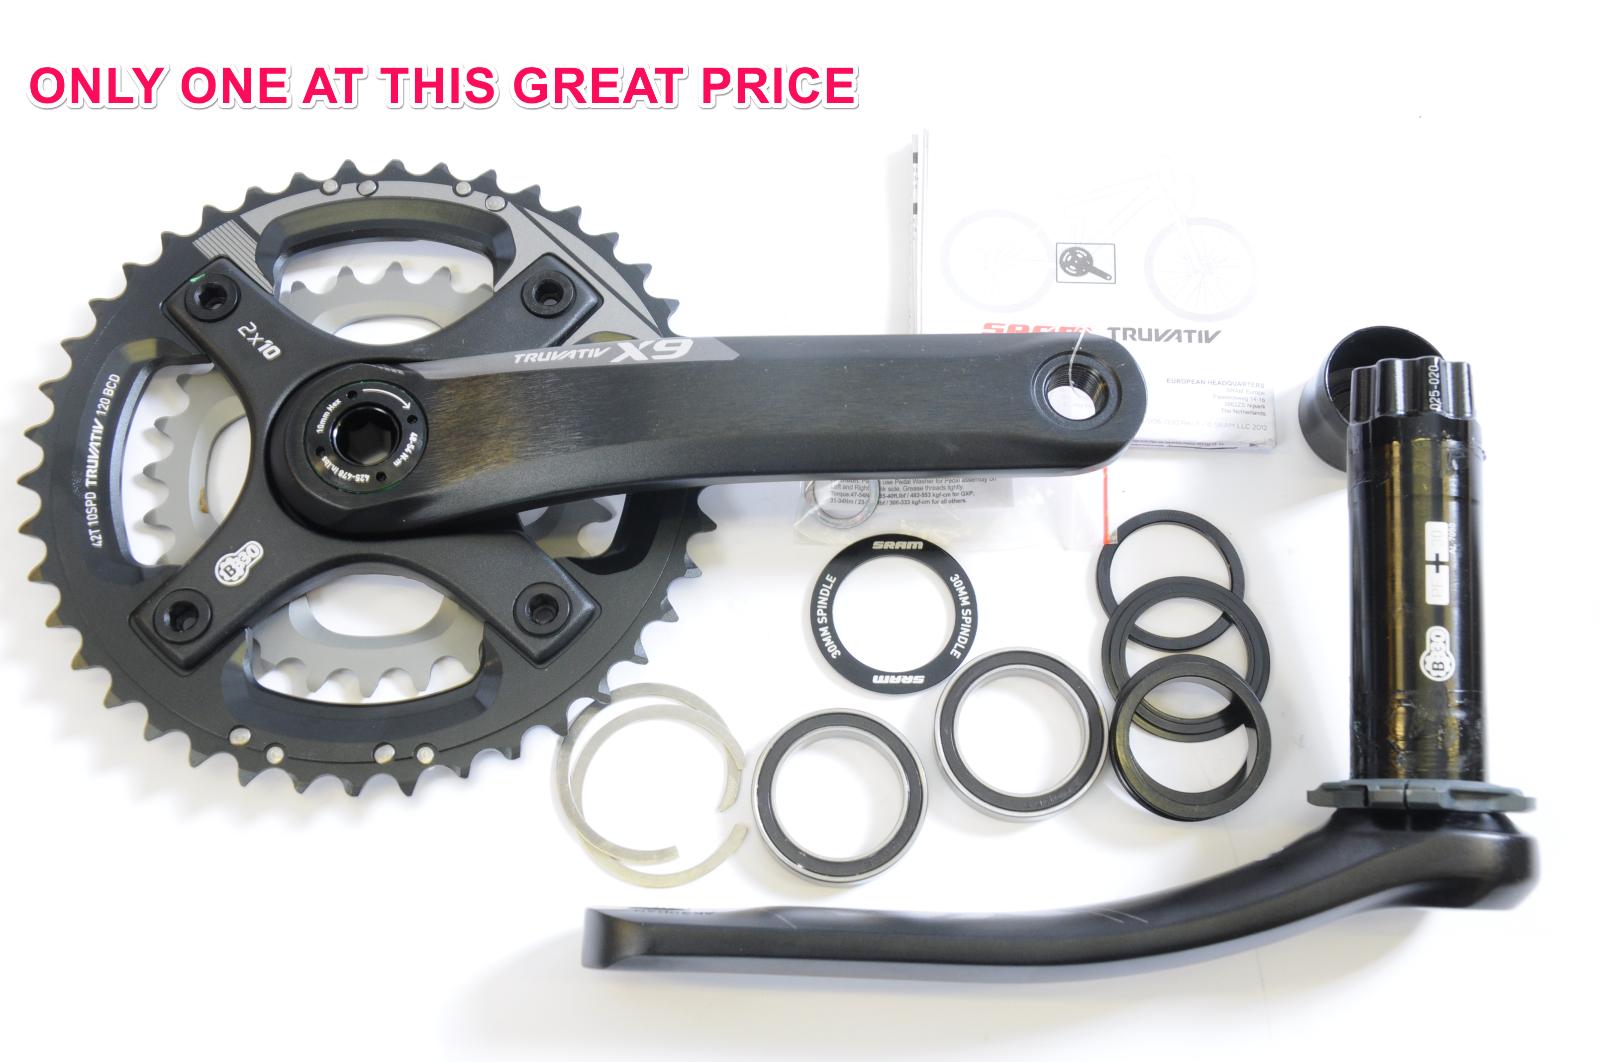 Truvativ SRAM X9 2.2 10 Velocità Doppio chainwheel pedaliera in BB30 4228T 170mm Manovella